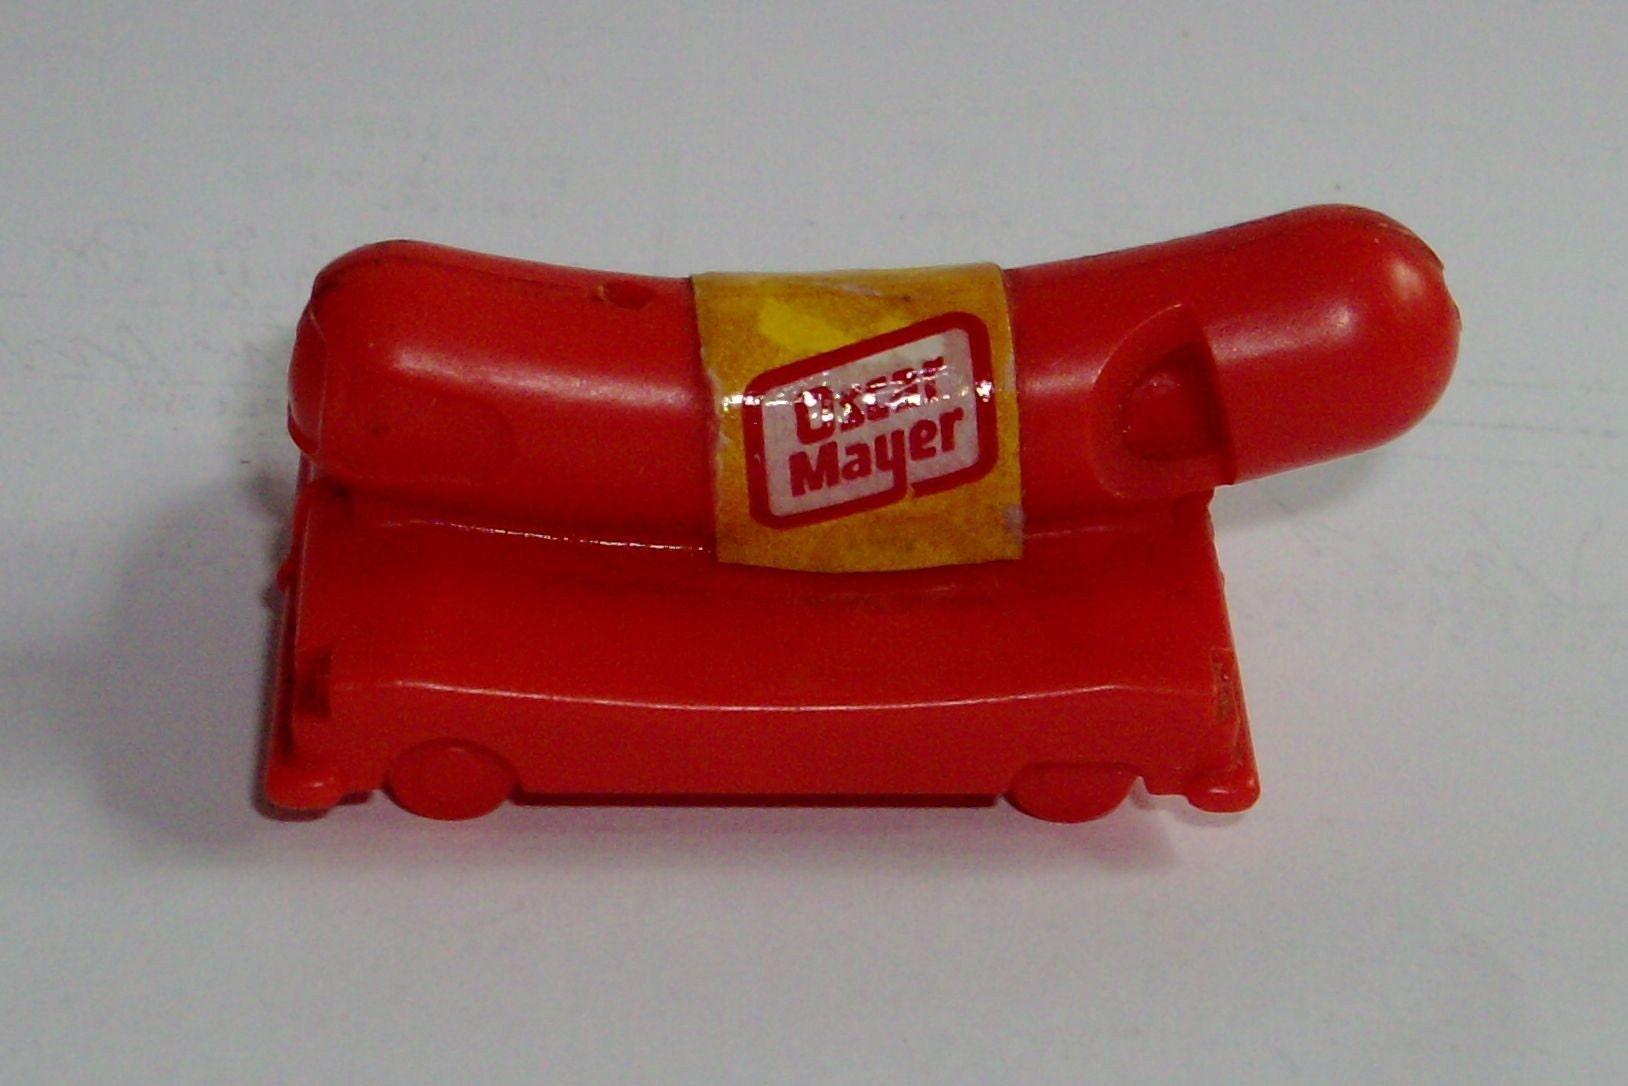 Guest Post Weinermobile Food Truck furthermore Article 3e244972 9ba2 58a2 9500 6a29594bd76a additionally Funnies moreover The Original Oscar Meyer Weiner Whistle further Oscar Mayer Bacon Hot Dogs IWscqZCcunVRu 7CVhC4Cd 7Cns4mdPLc5Cs4fV3 7CgSSDps. on oscar meyer dog truck